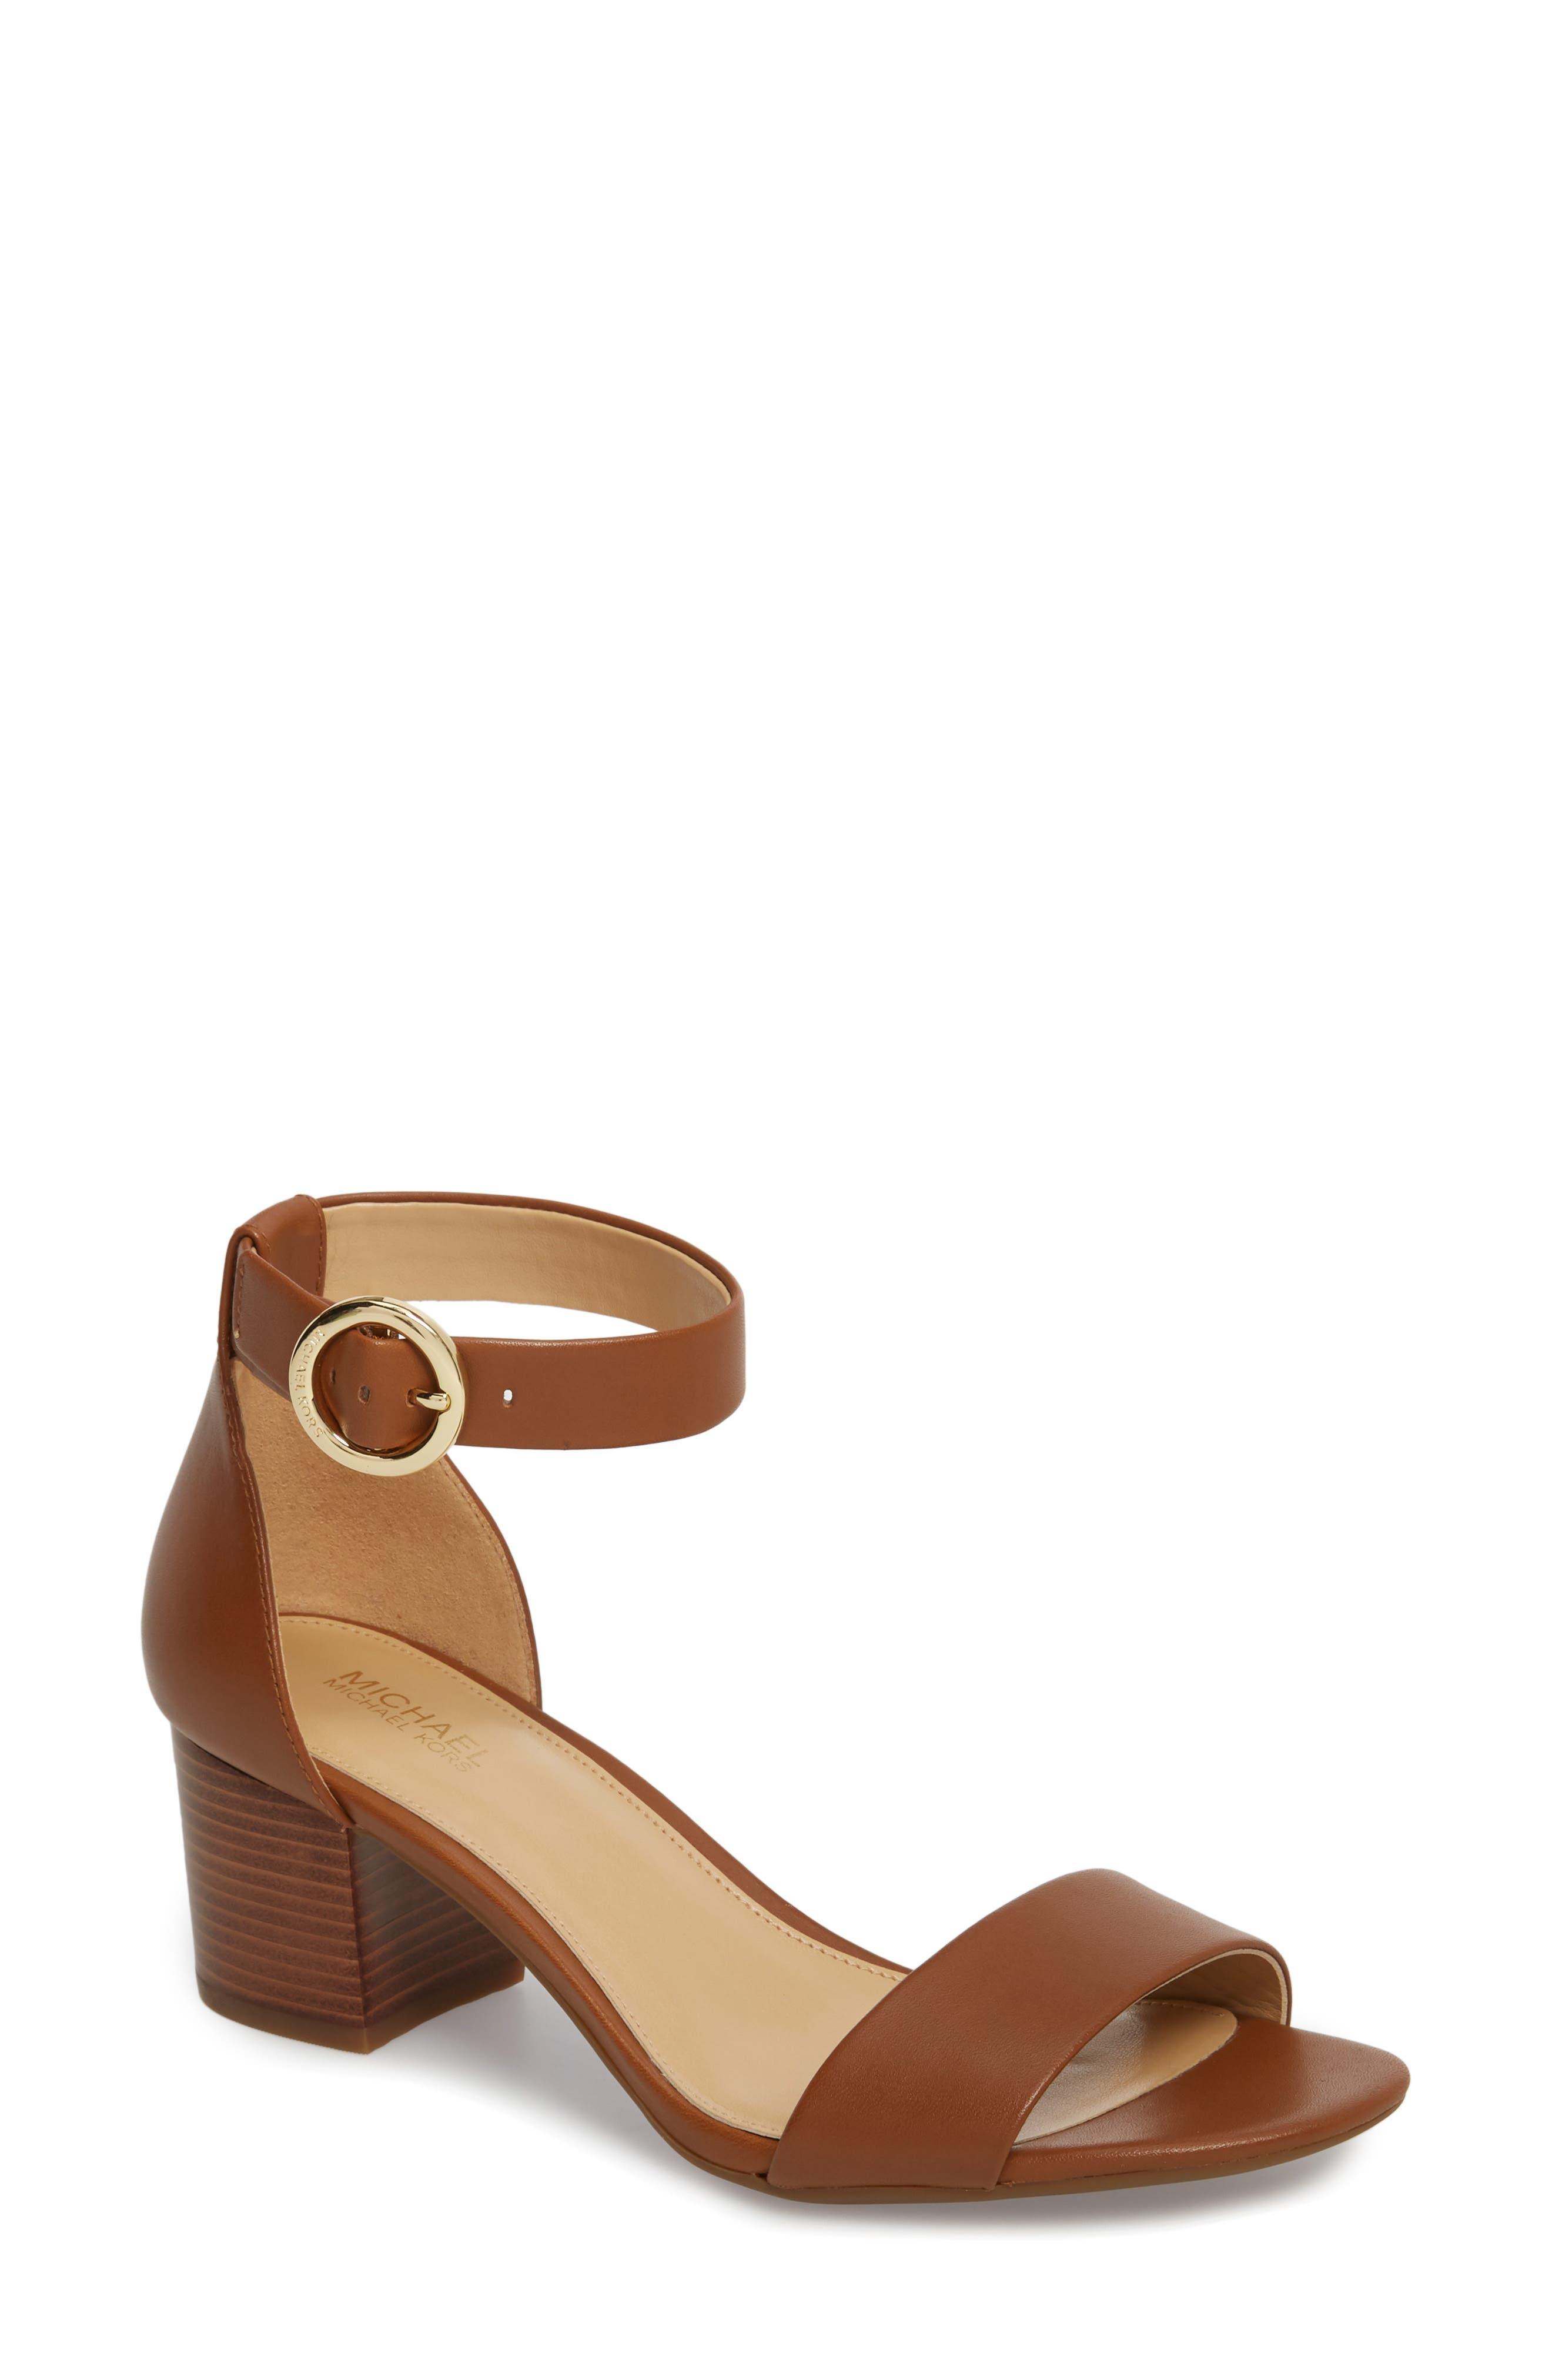 Lena Flex Mid, Luggage Vachetta/Stacked Heel